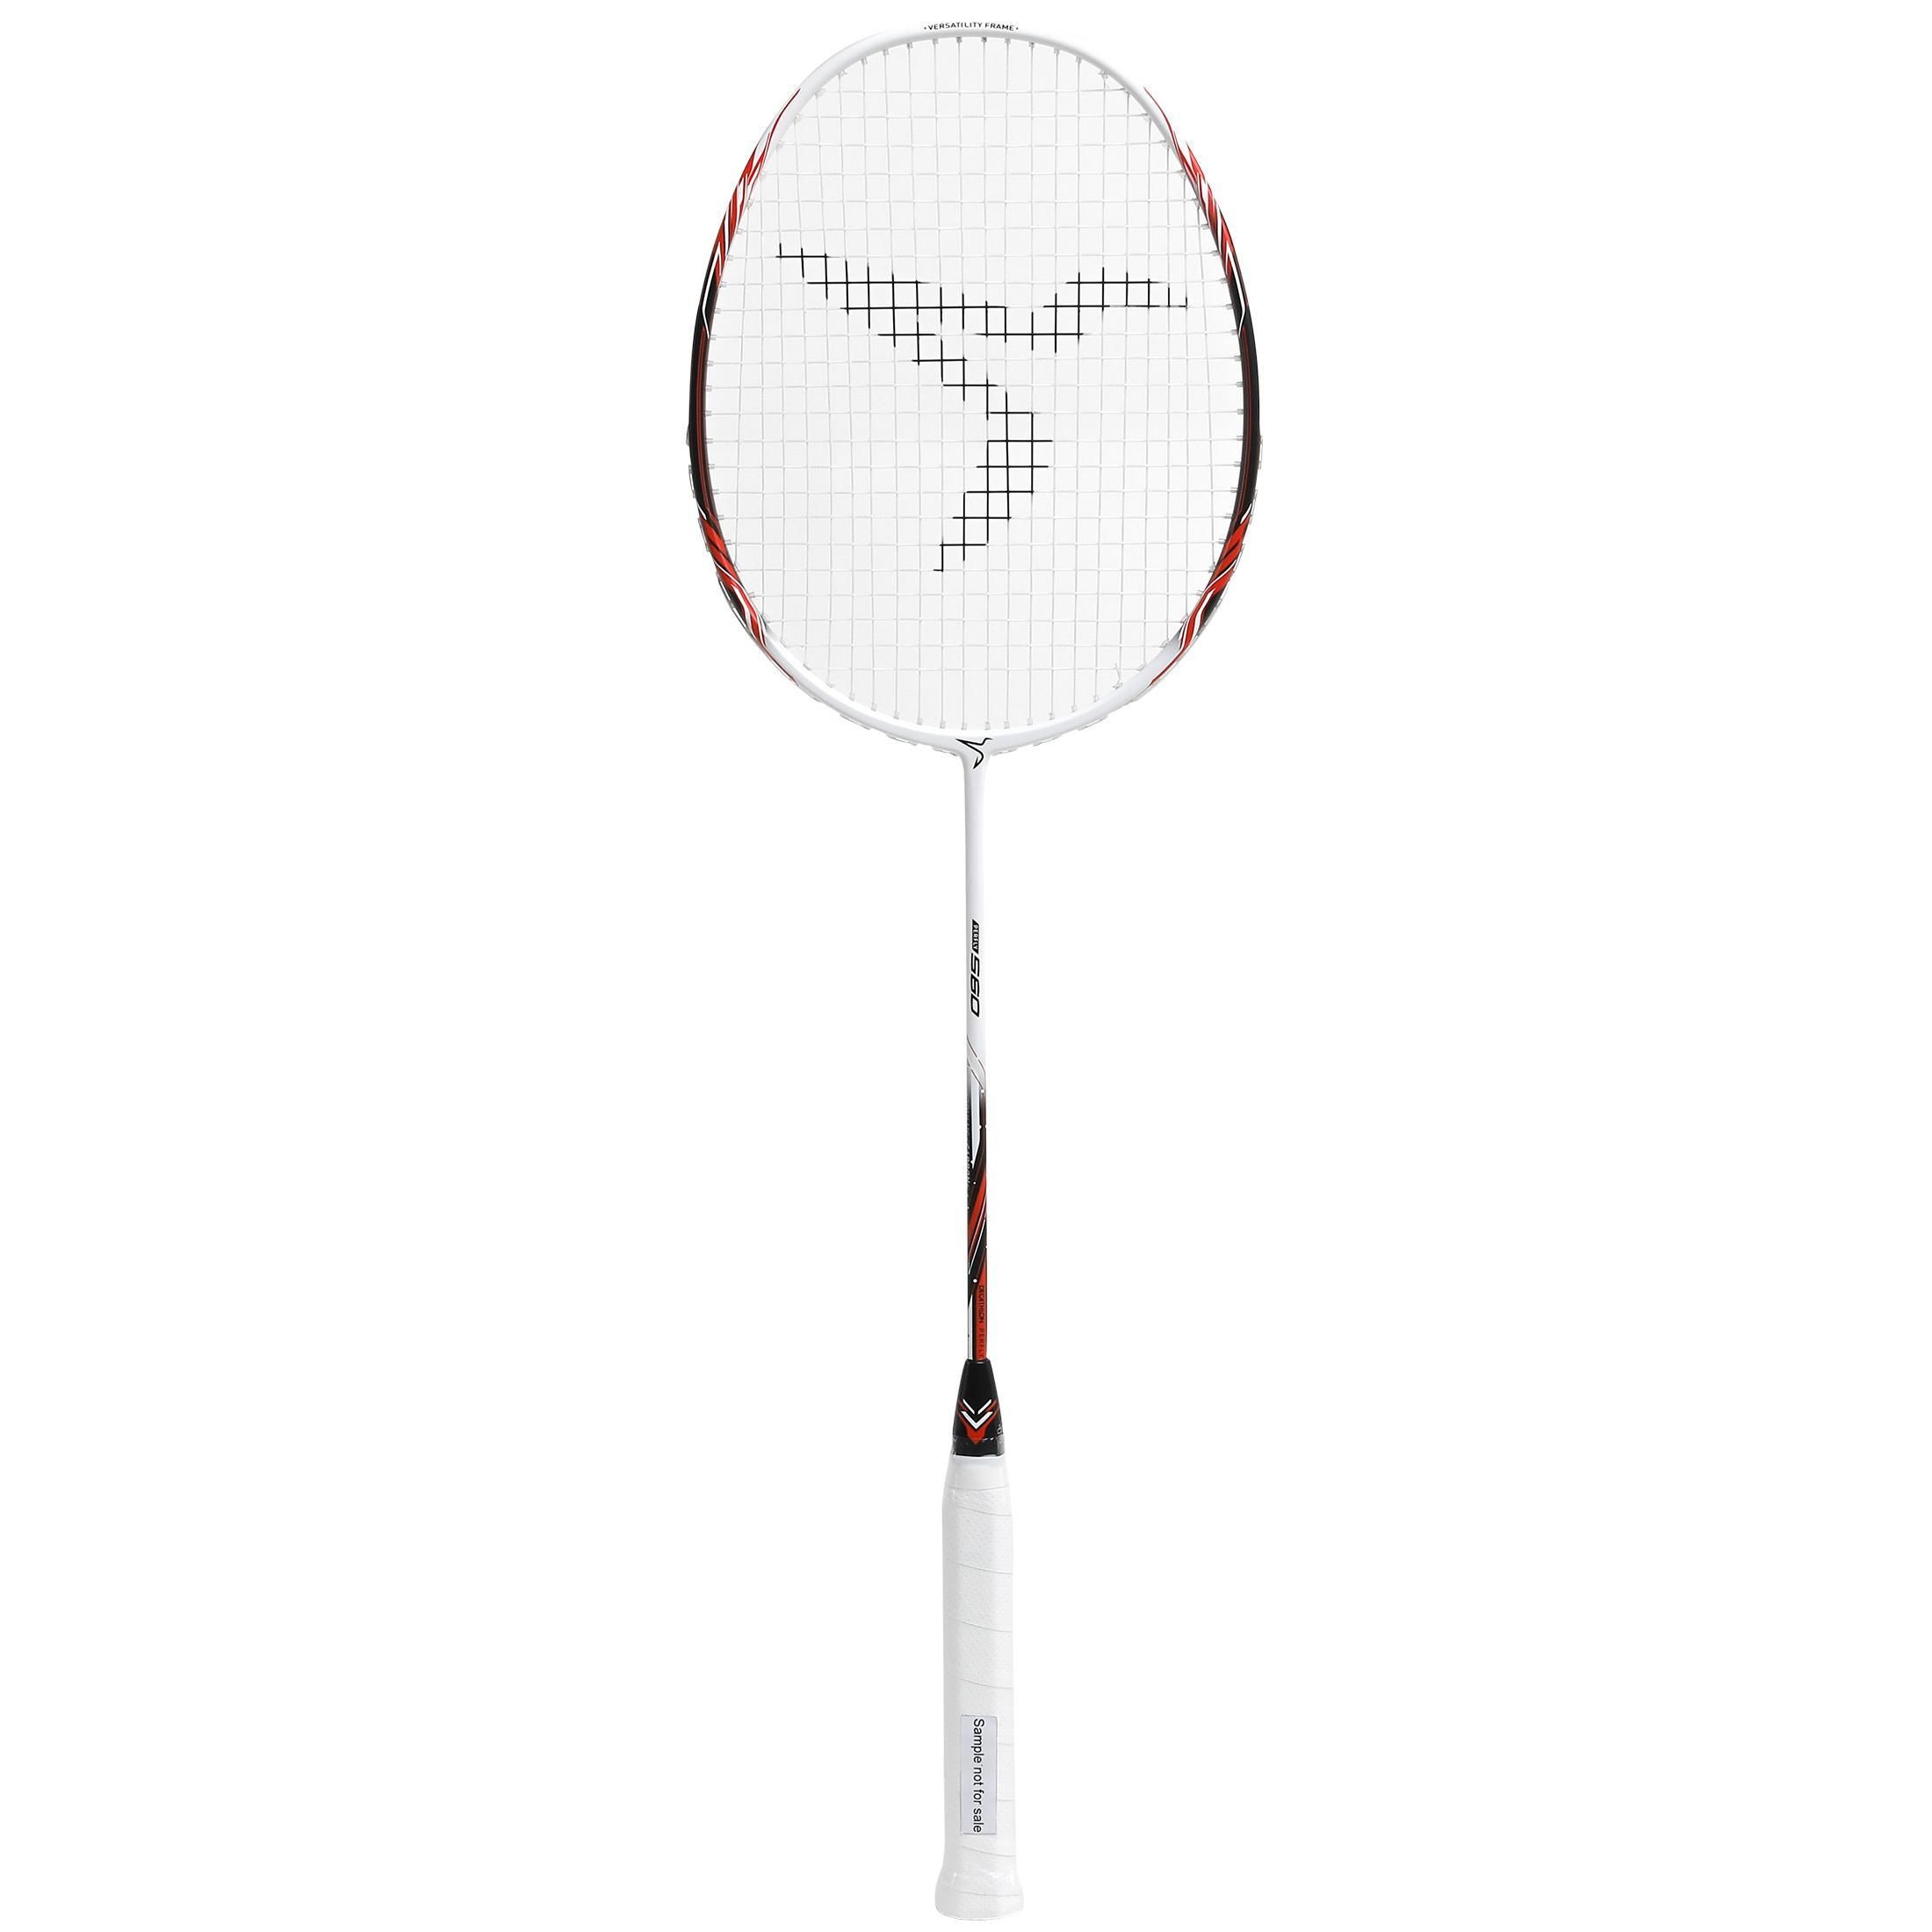 Rachetă badminton BR 560 Lite imagine